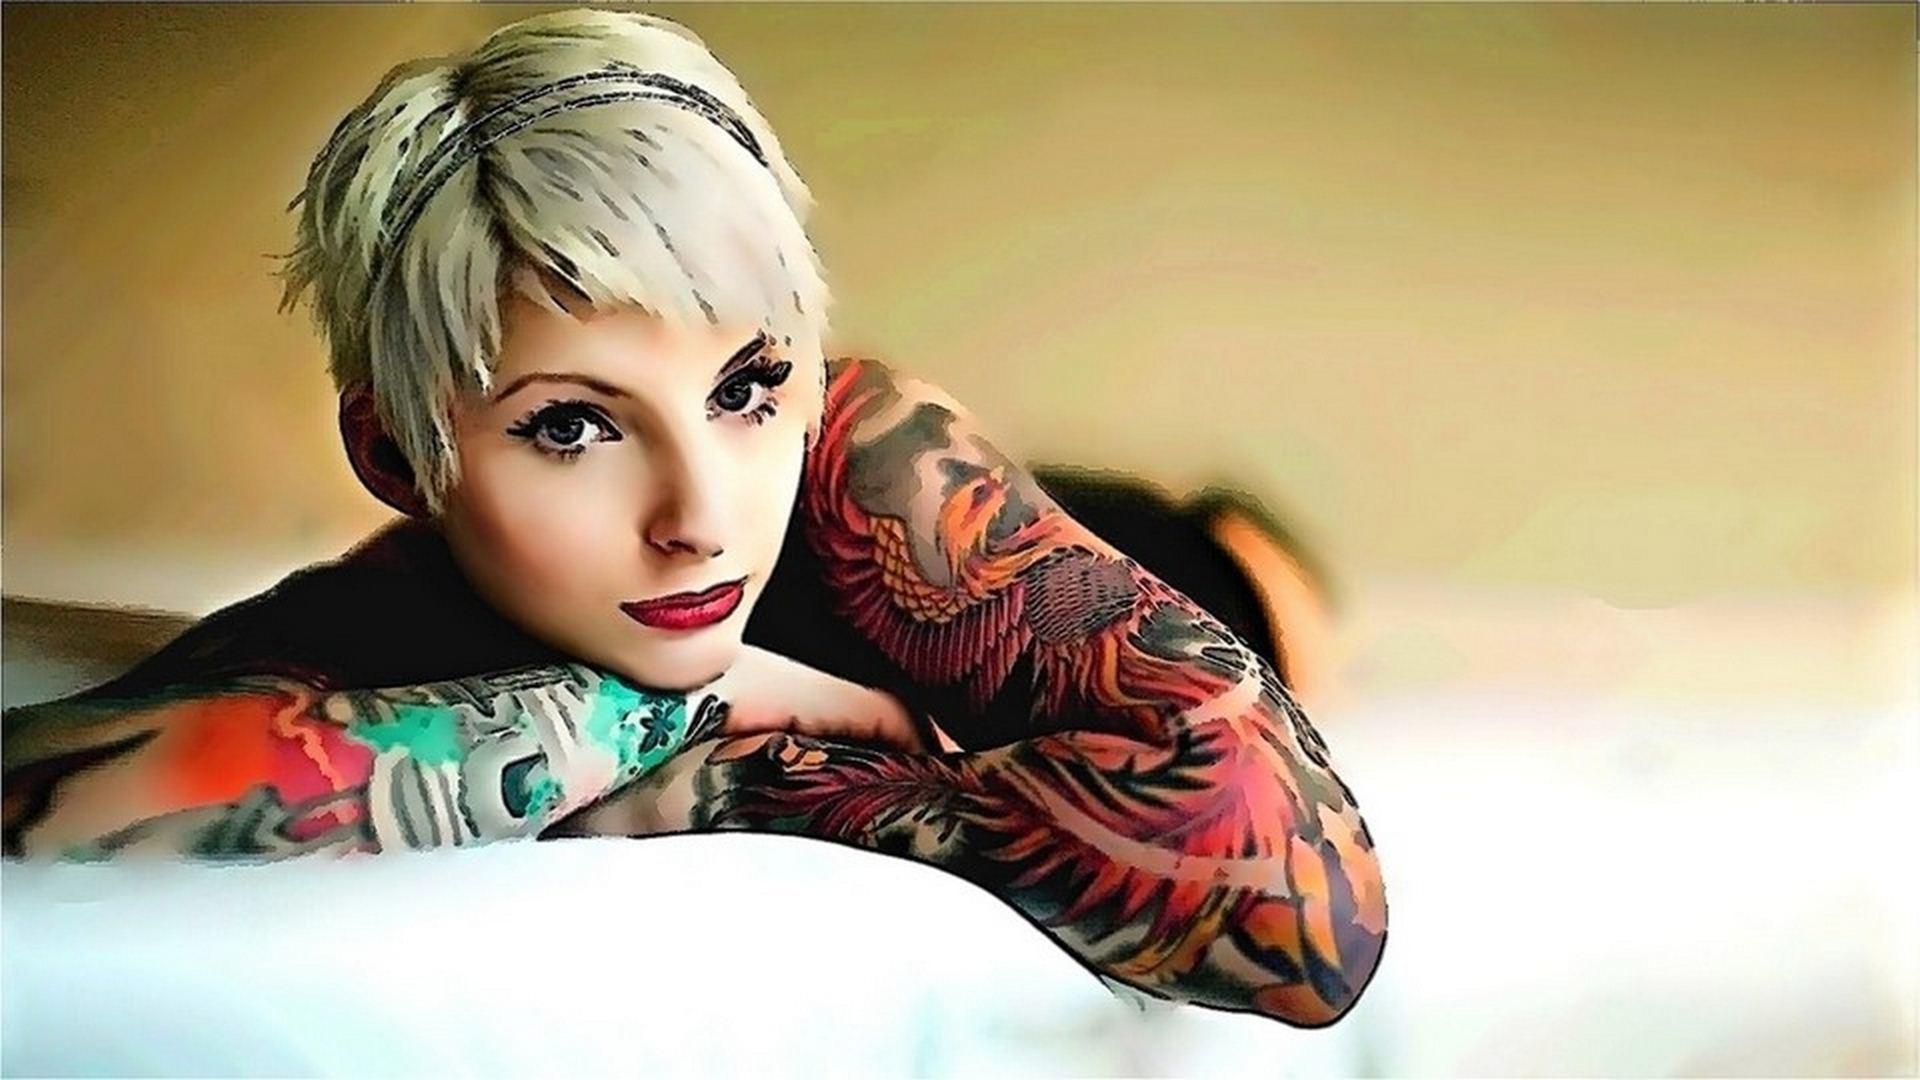 Anime Girl Tattoos Desktop Wallpaper: Desktop HD Wallpaper 1920×1200 Girl  Tattoo Wallpapers (